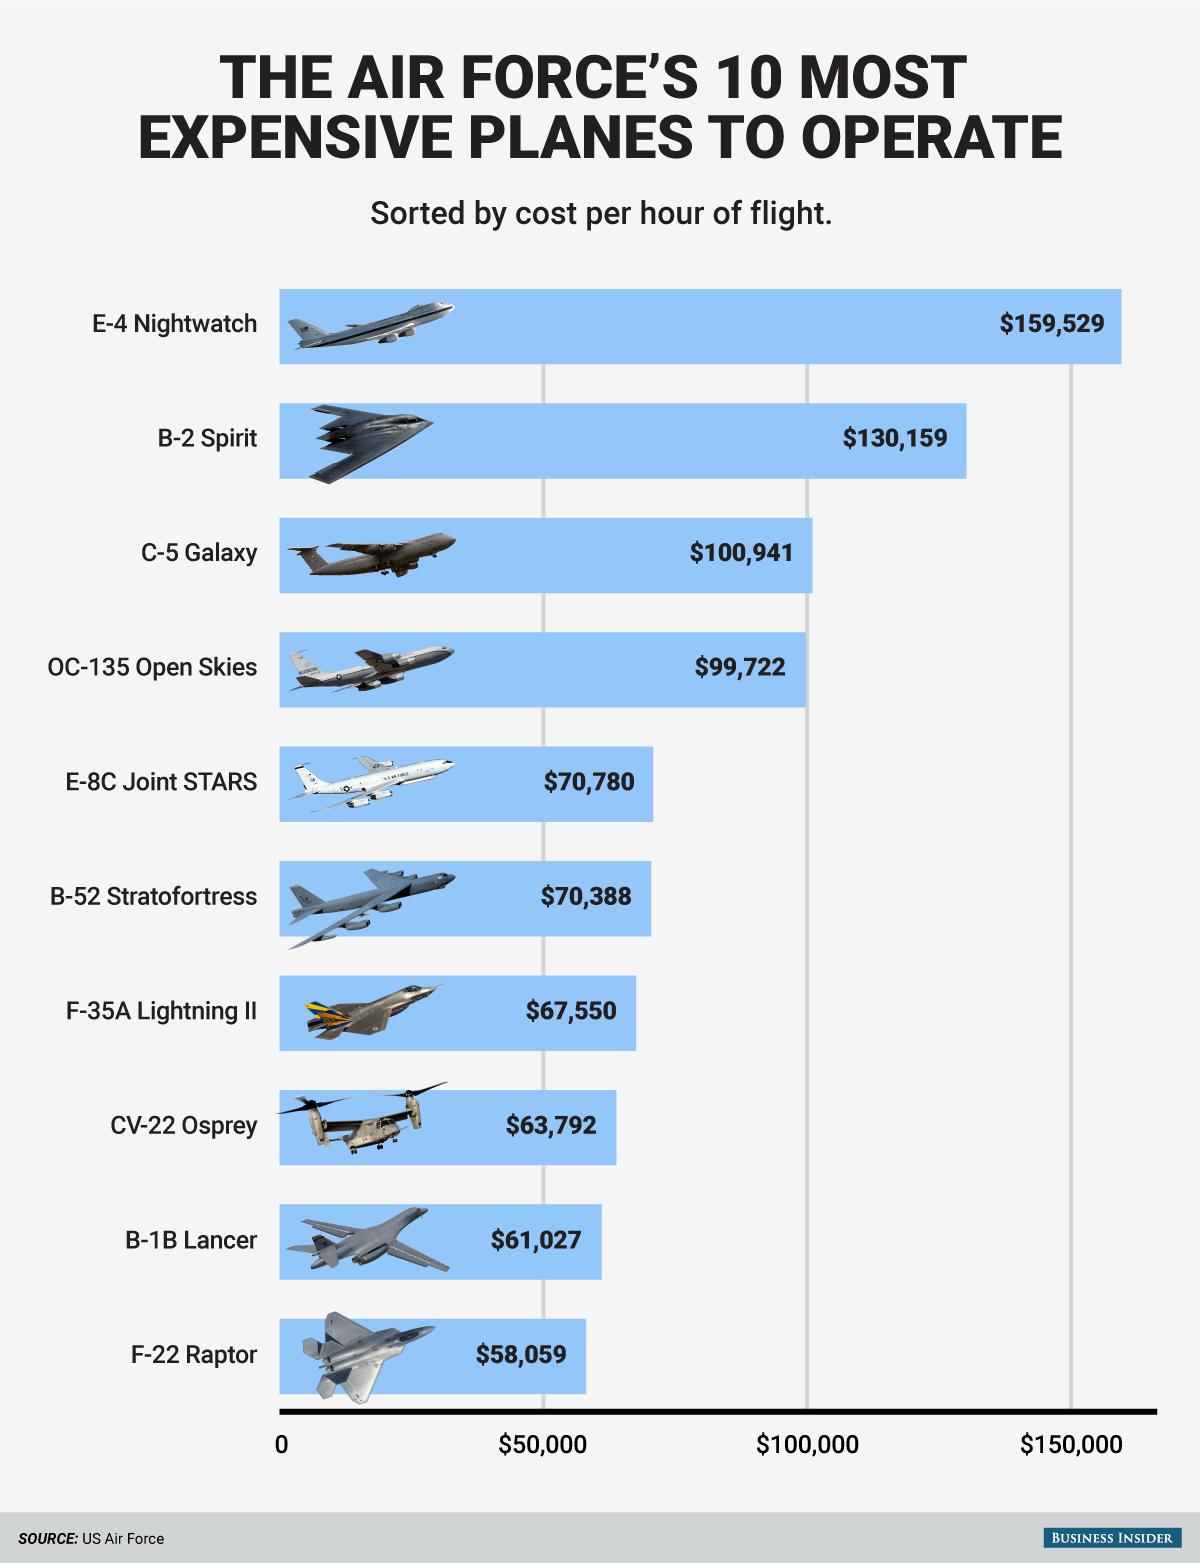 Air Force Plane Cost Per Flight Hour Chart